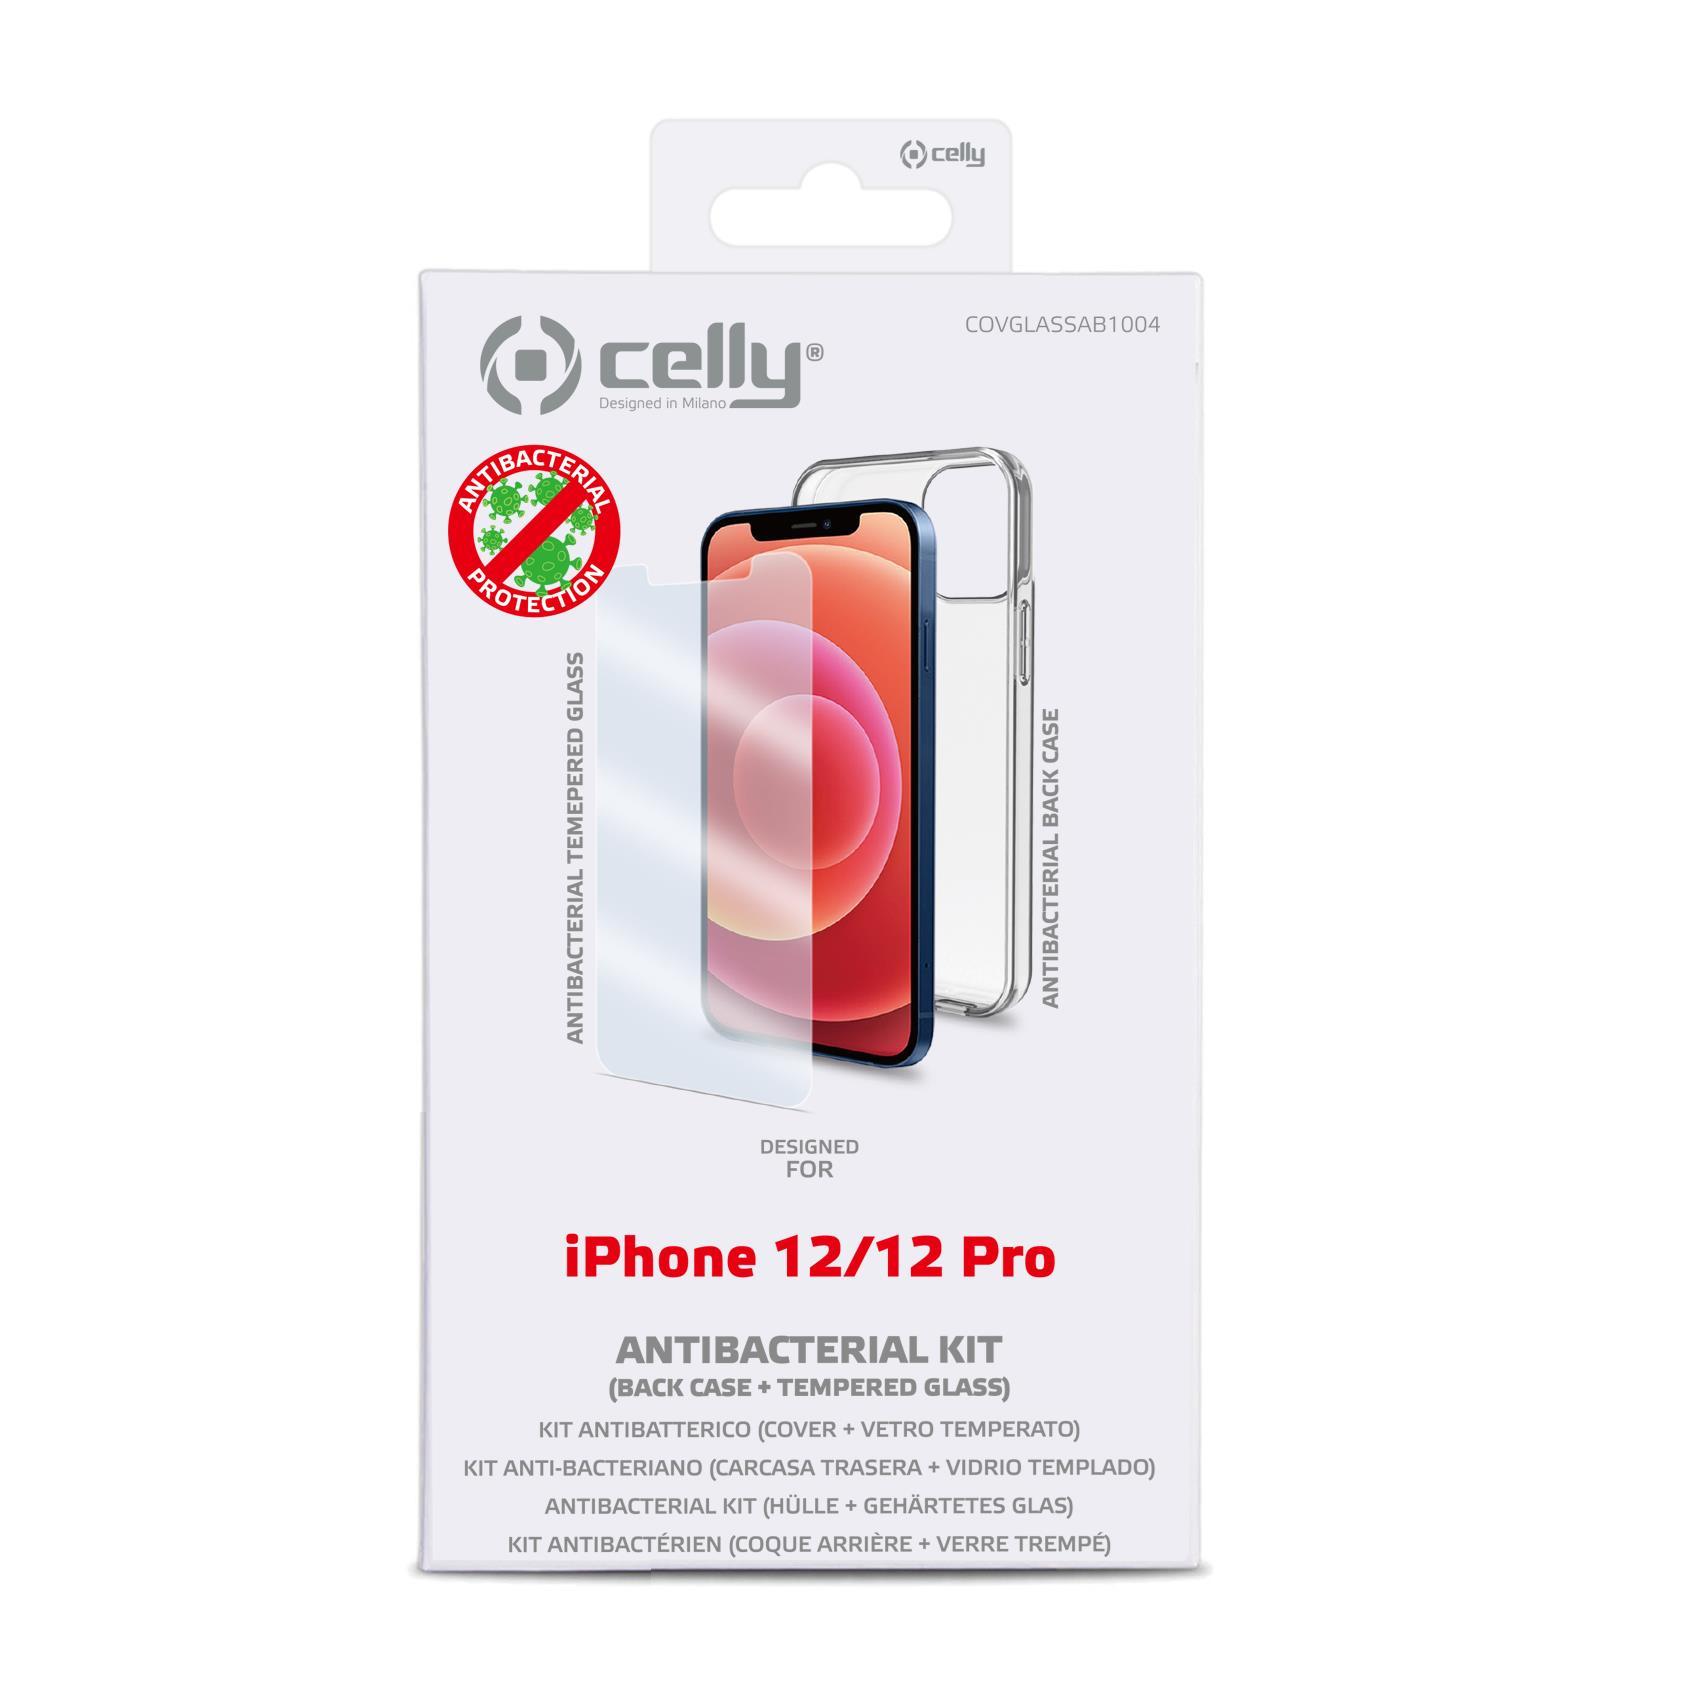 COVGLASSAB - iPhone 12/12 Pro